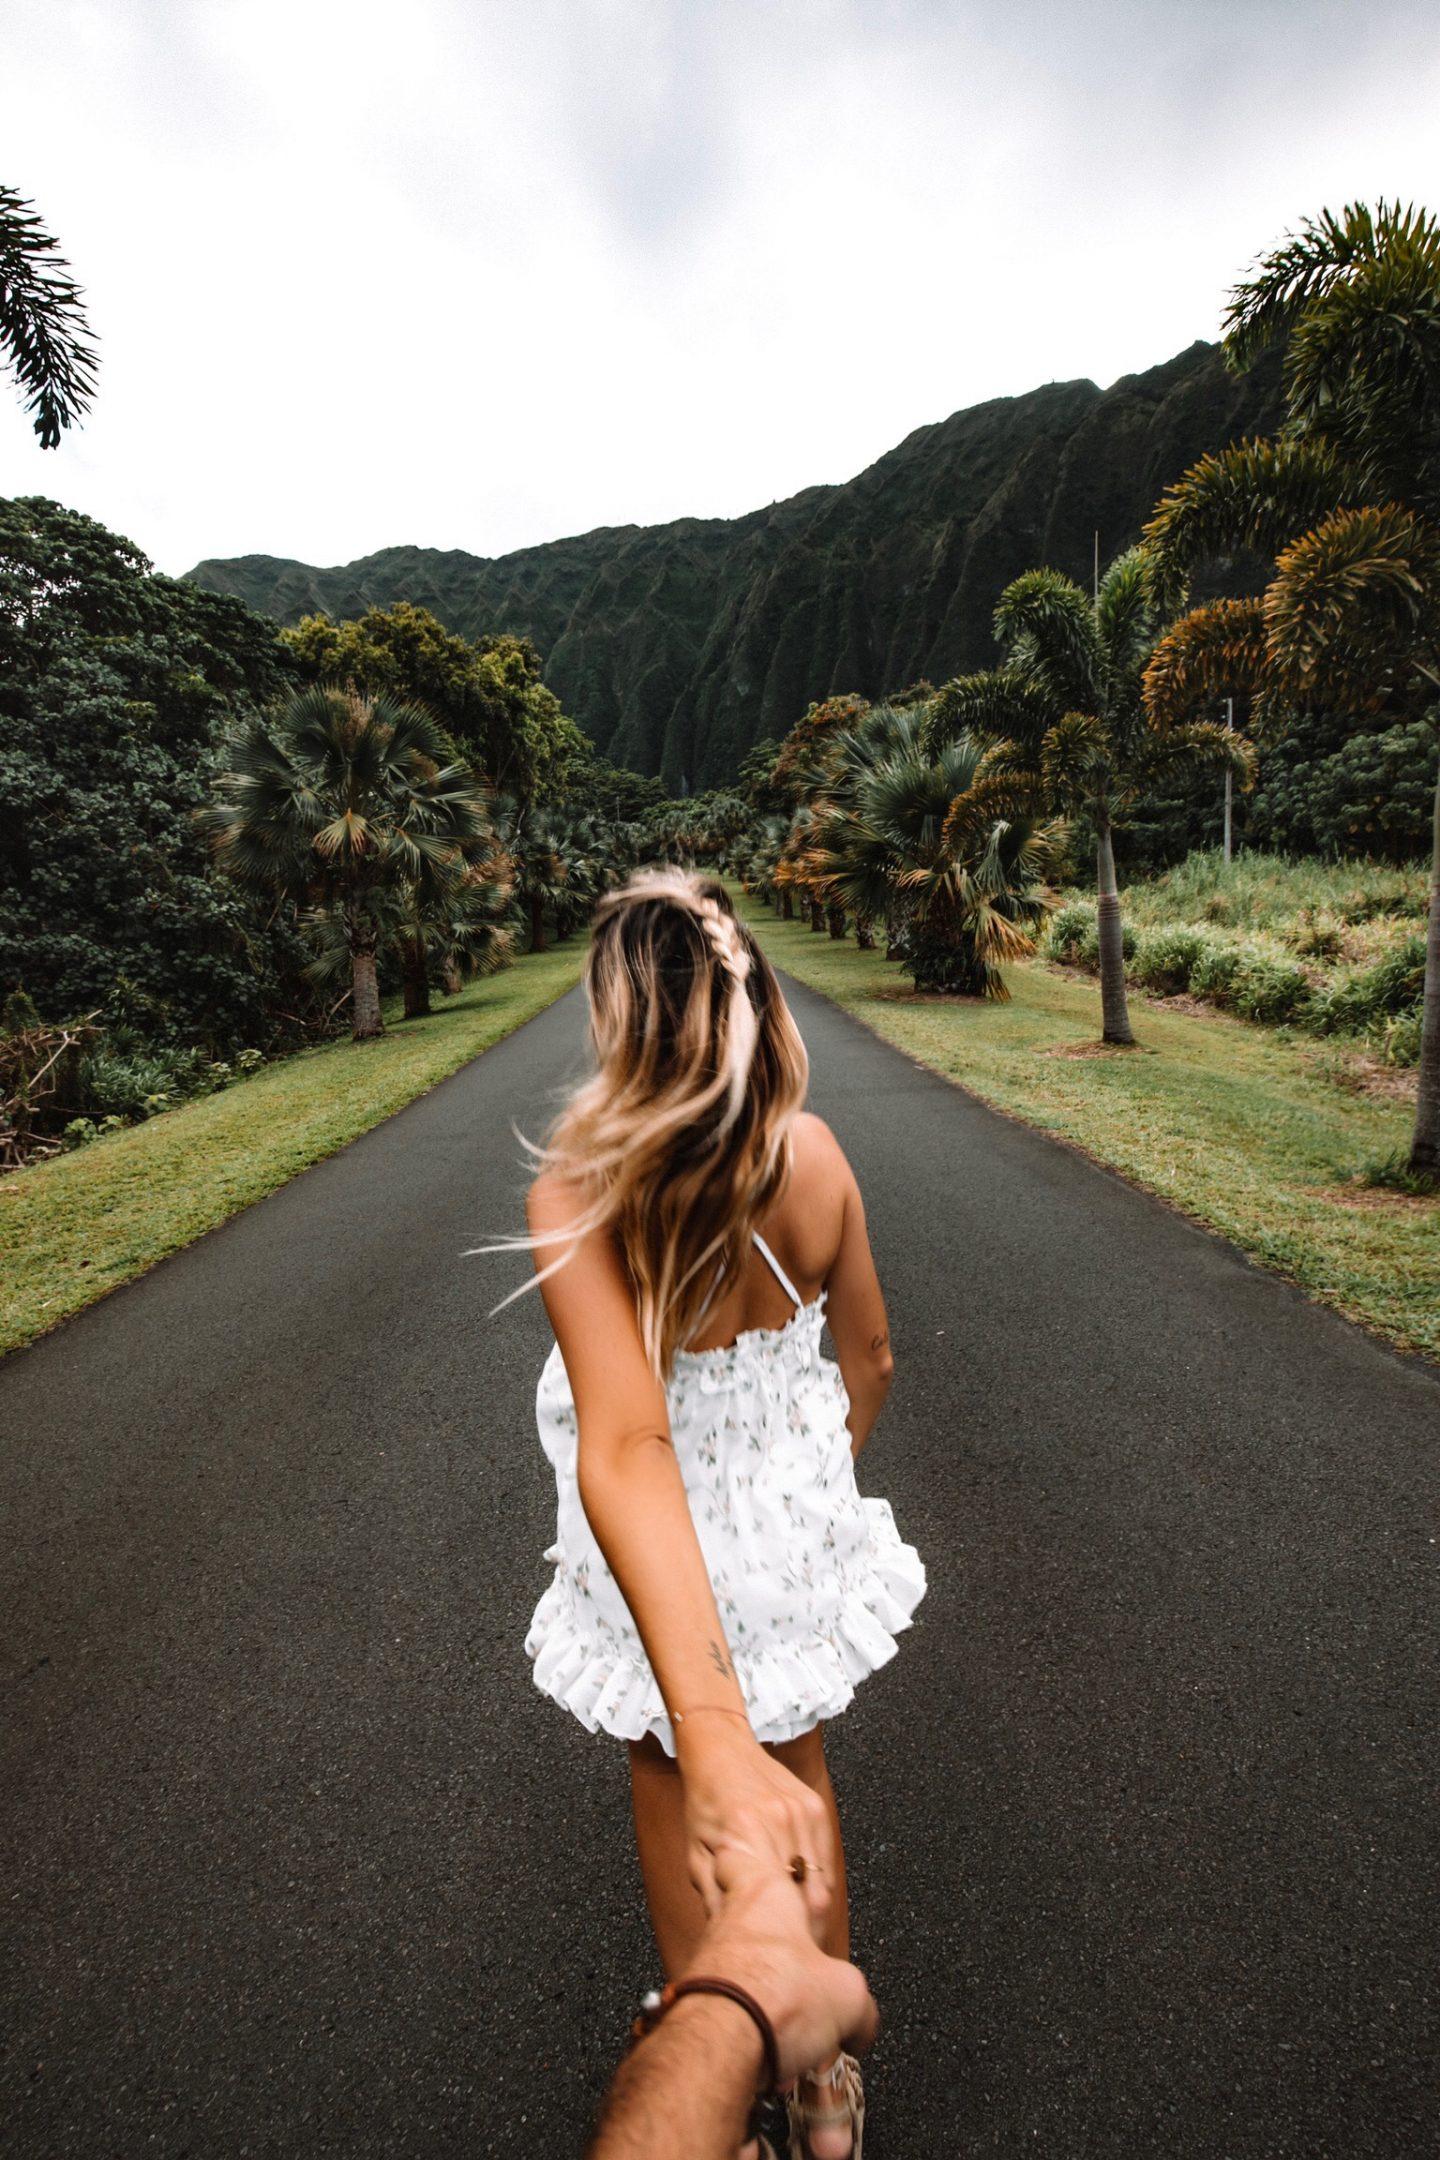 Ho'omaluhia botanical garden Hawaii - Blondie Baby blog mode et voyages